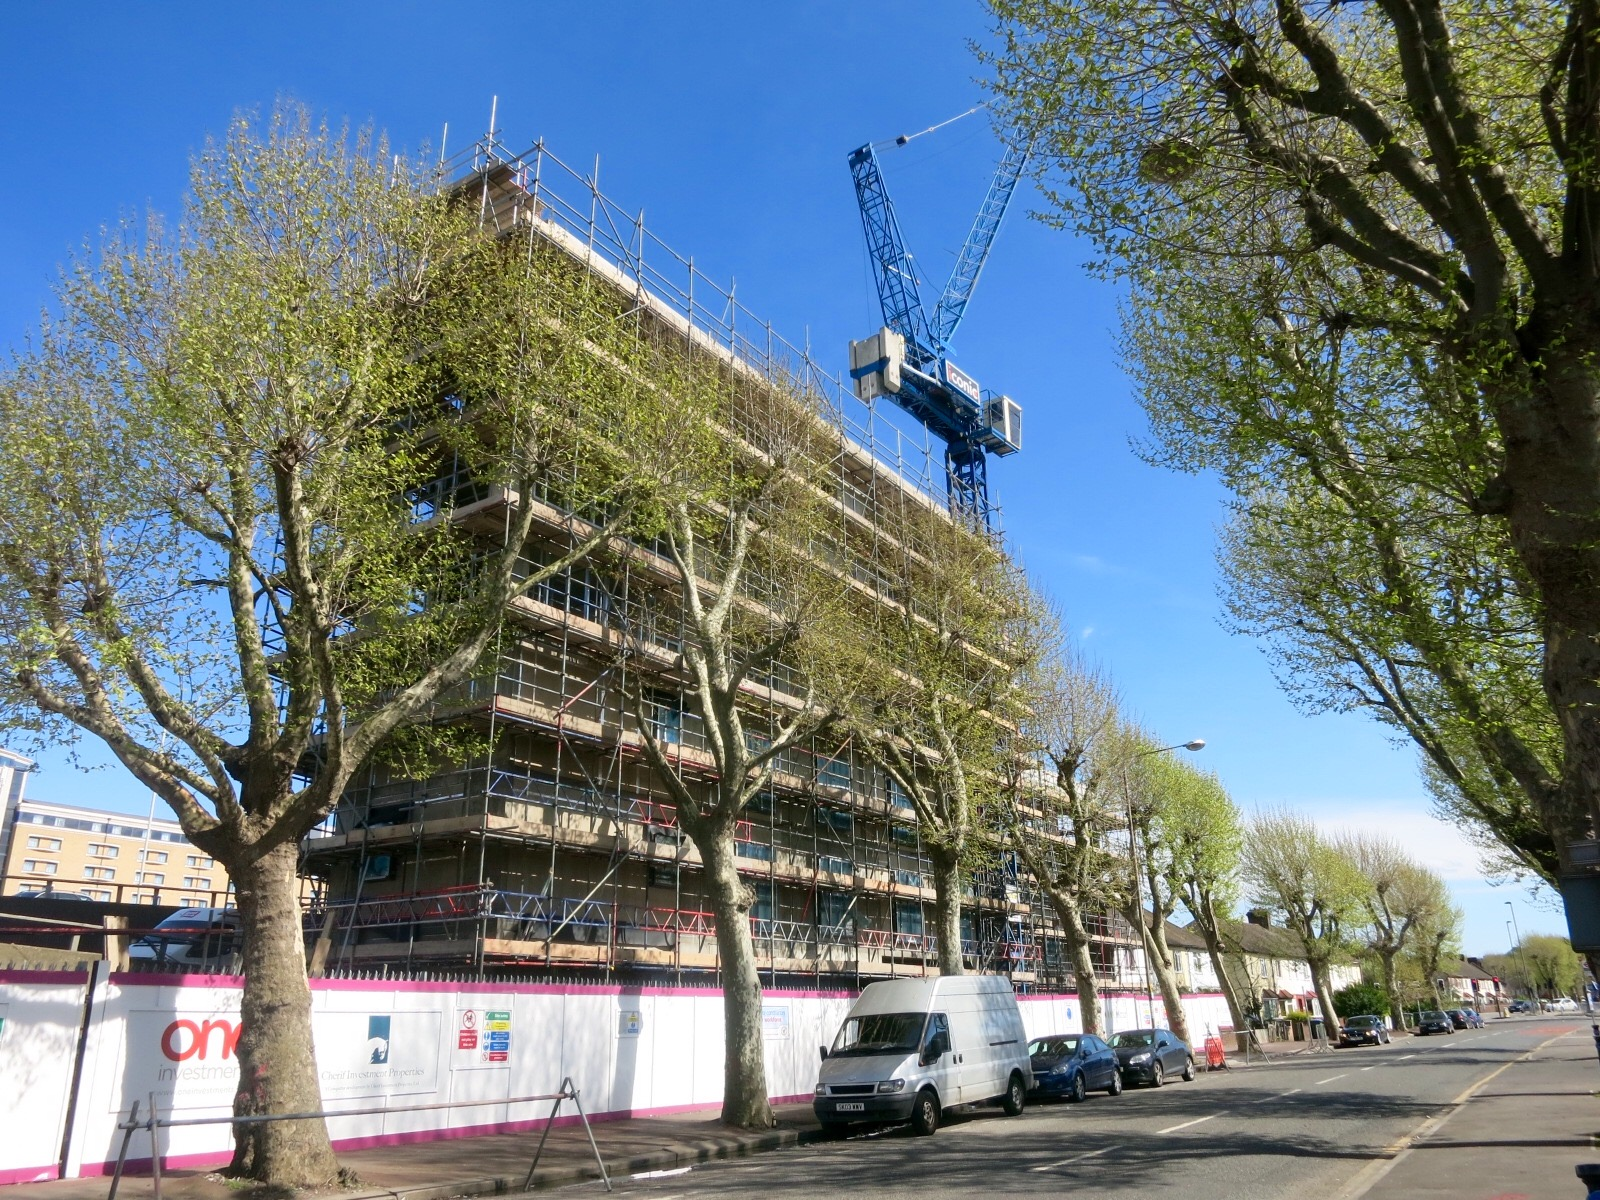 Construction progress - May 2016 [greenpenlondon]